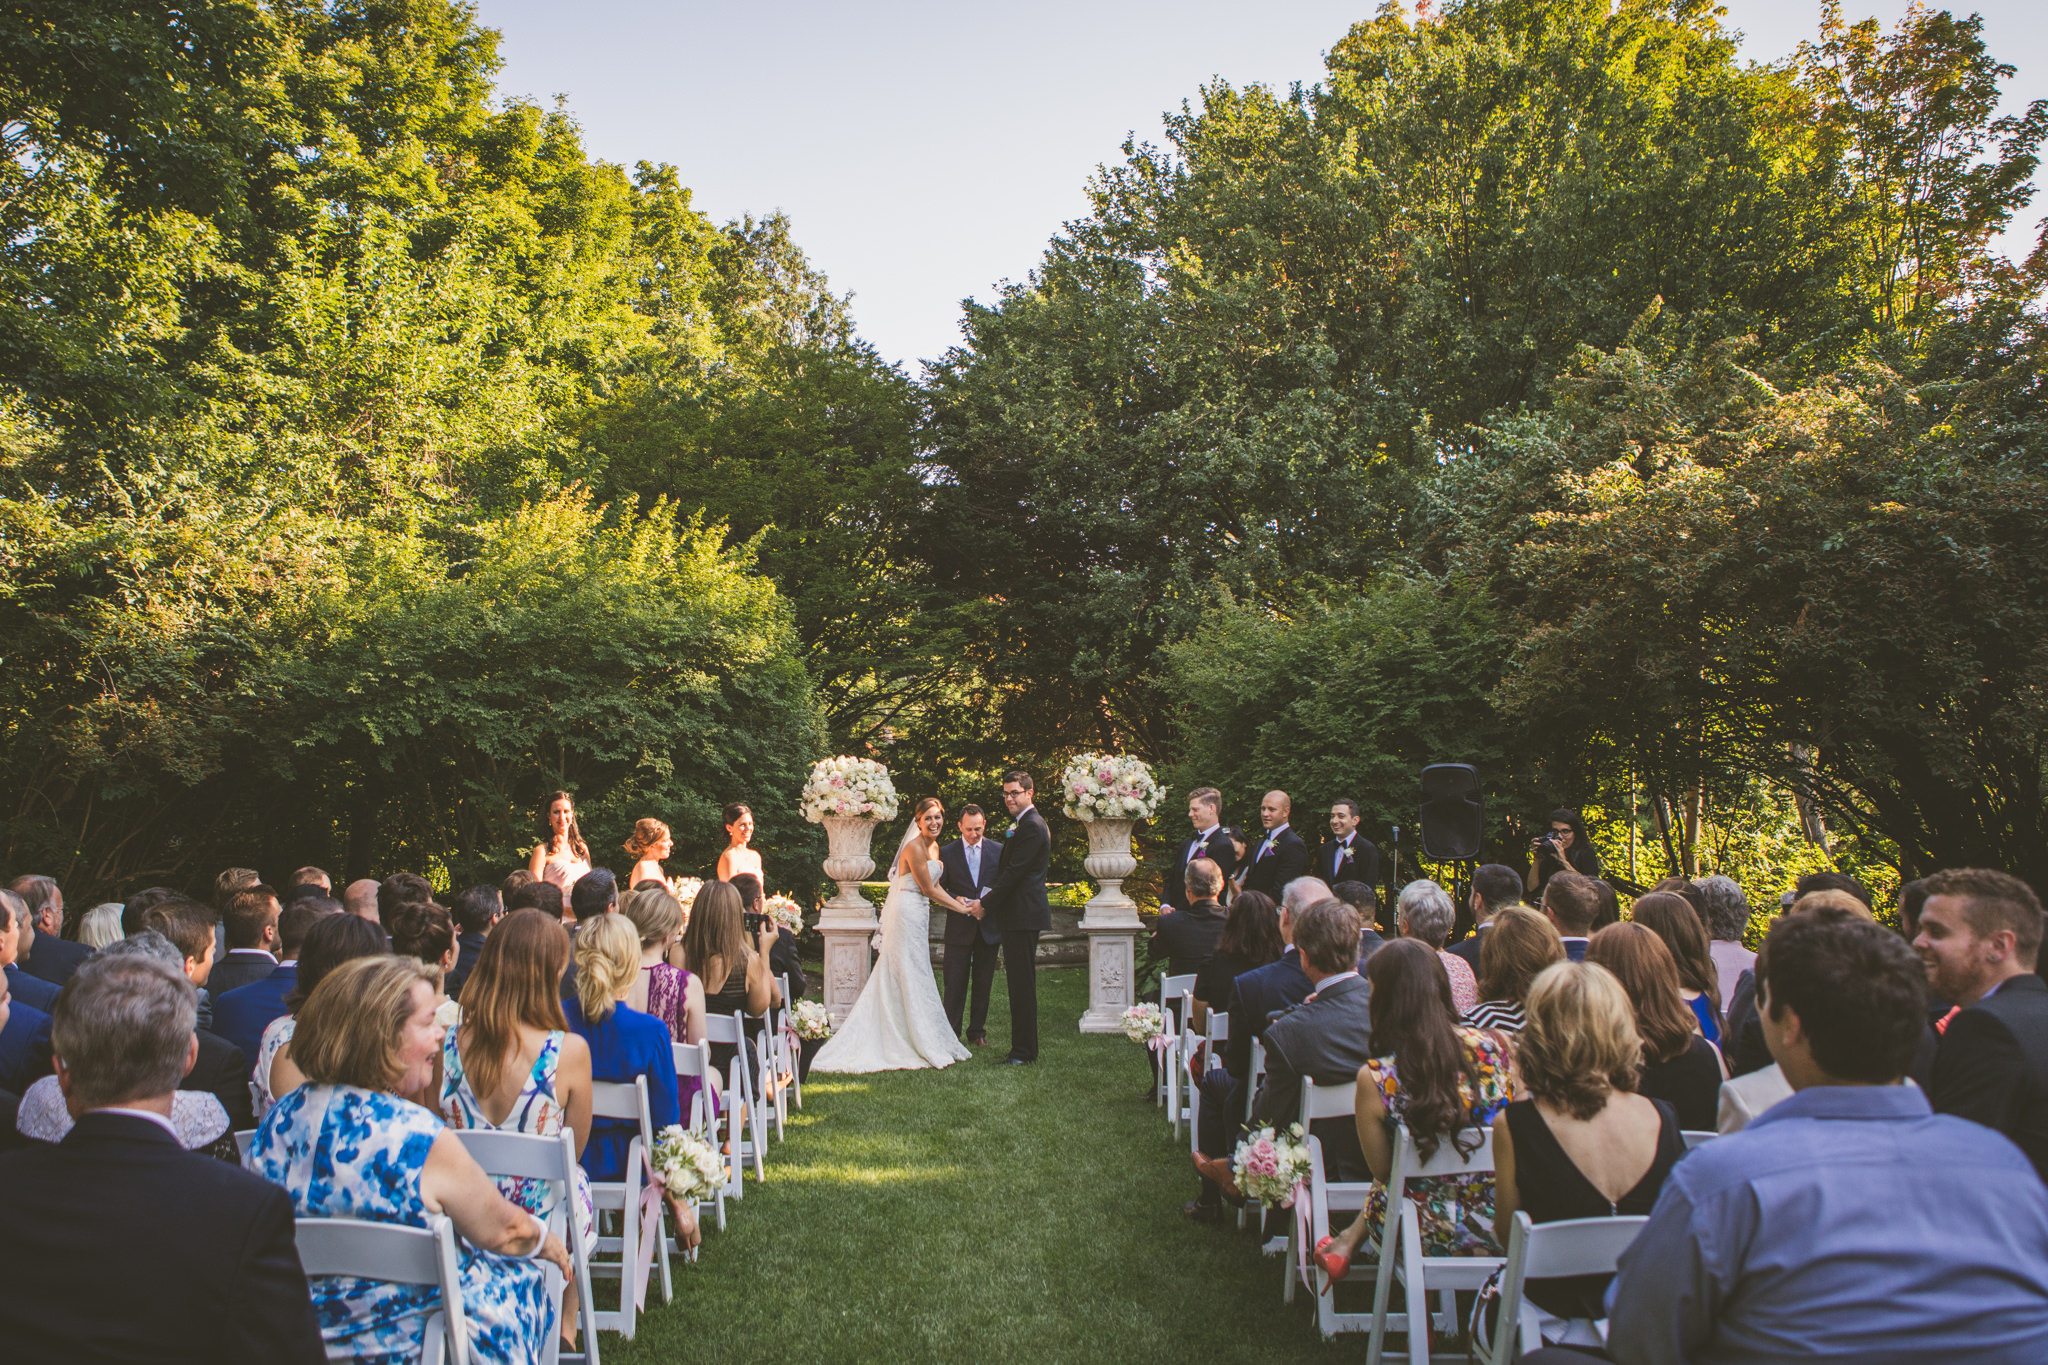 mclean house wedding photos 340 - McLean House Wedding Part 1